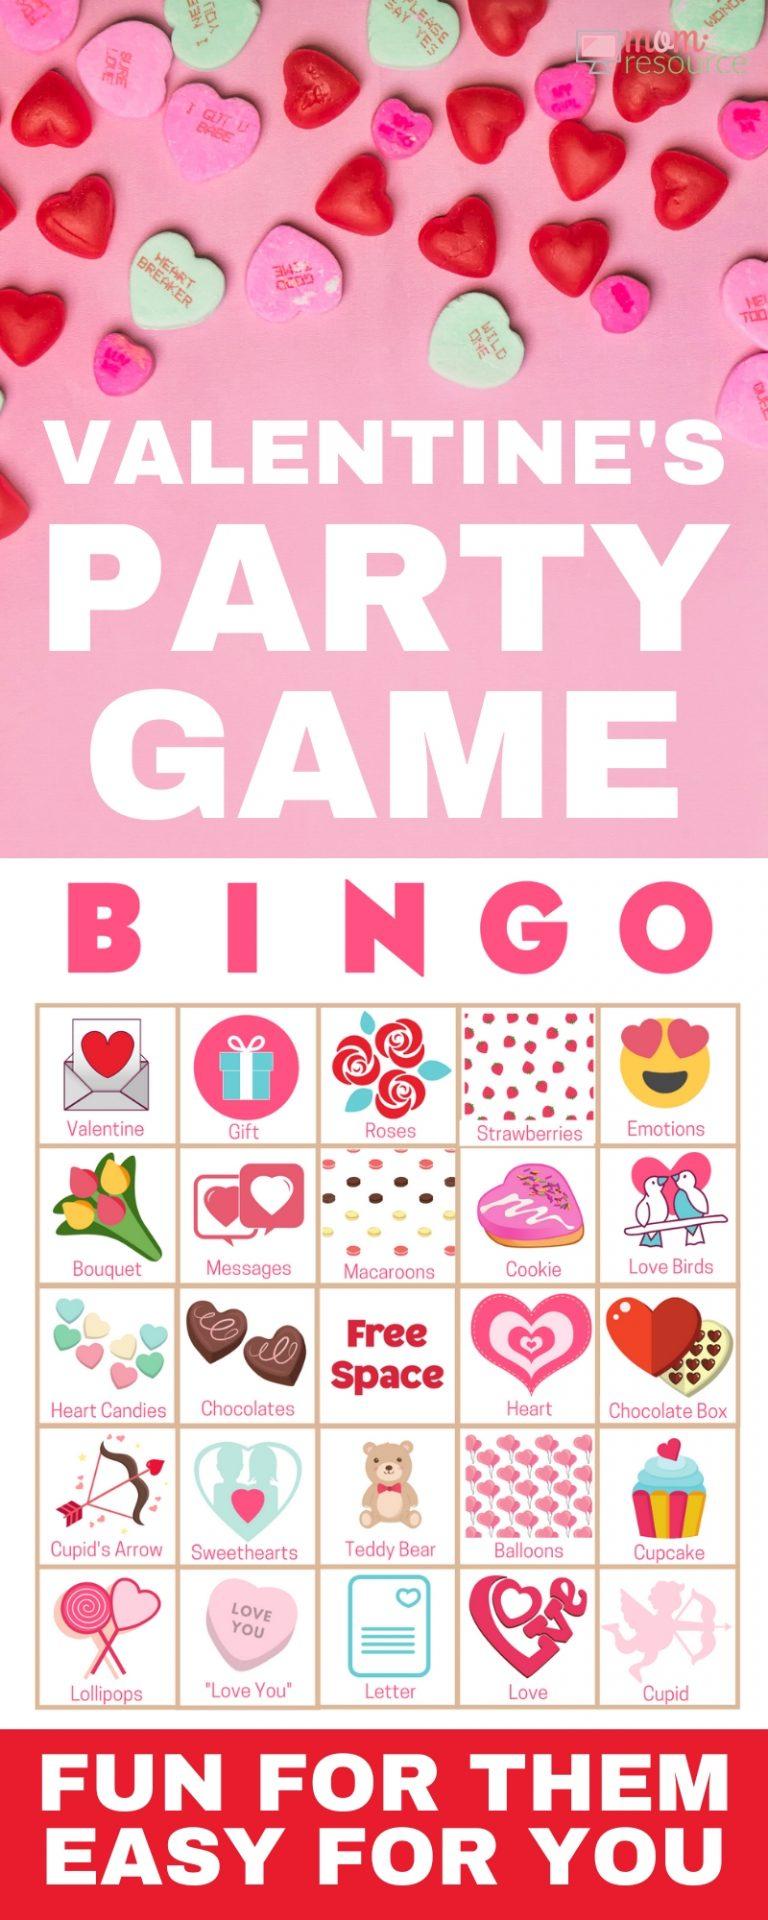 Valentine's Day Bingo Cards - Easy To Play, Modern & Fun